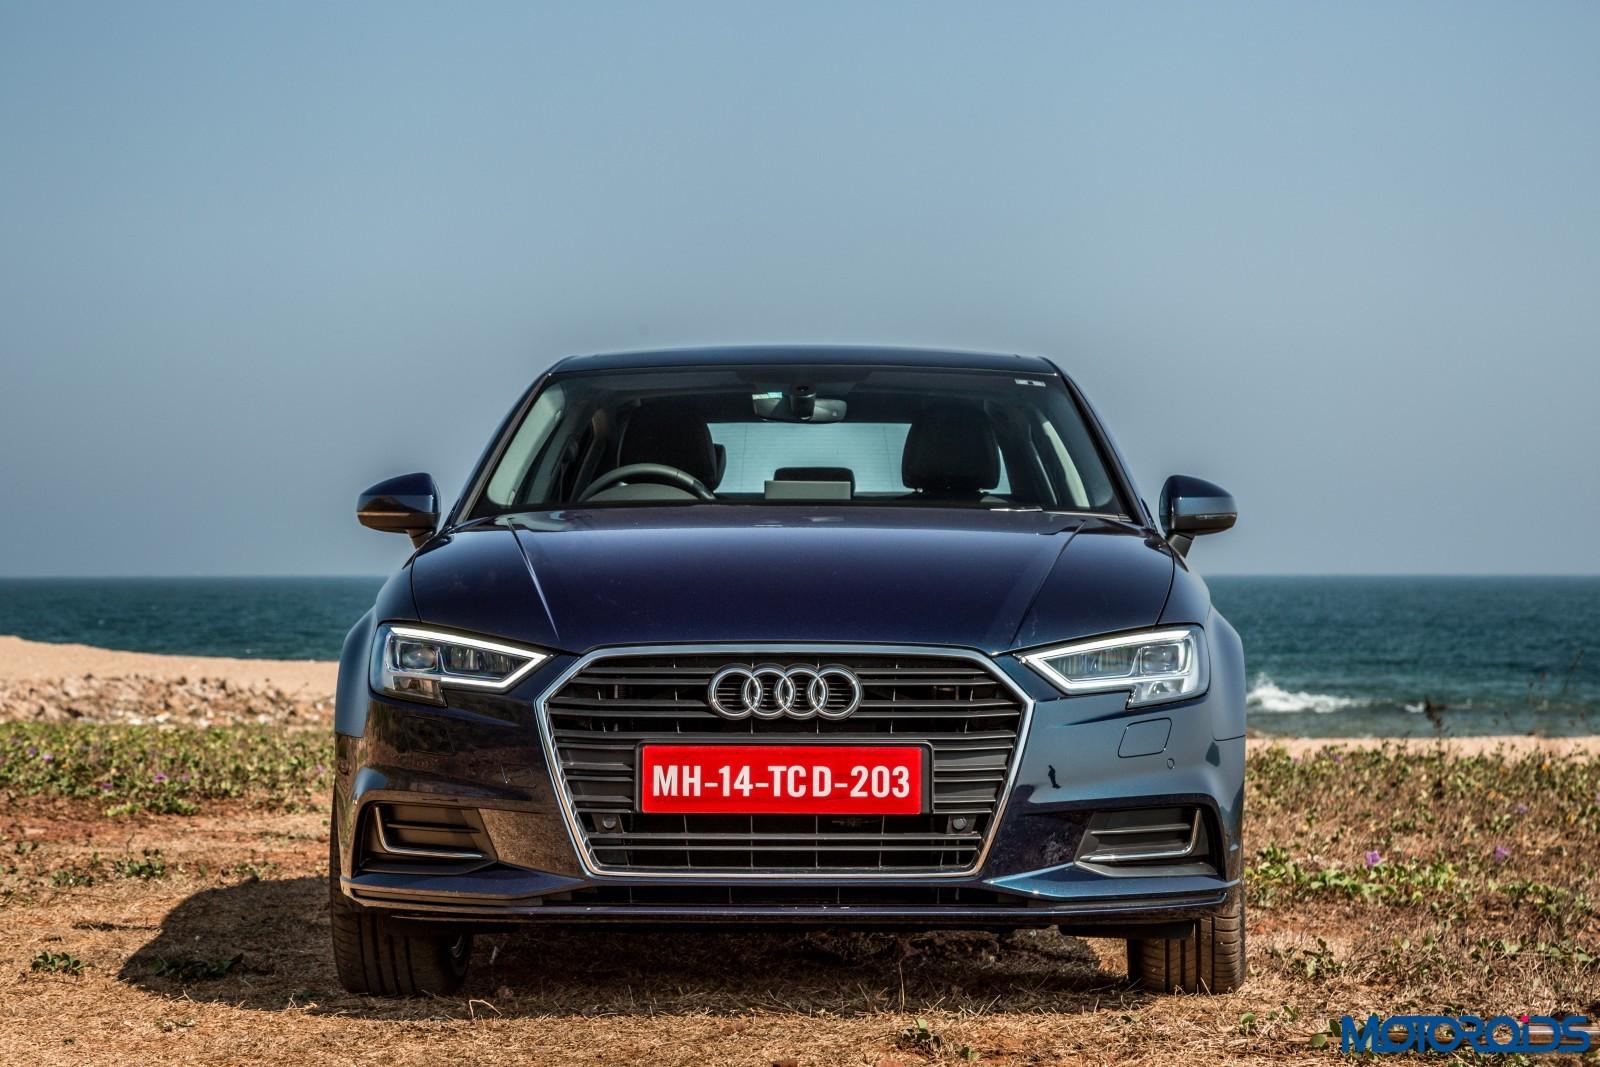 new-2017-Audi-A3-facelift-blue-1